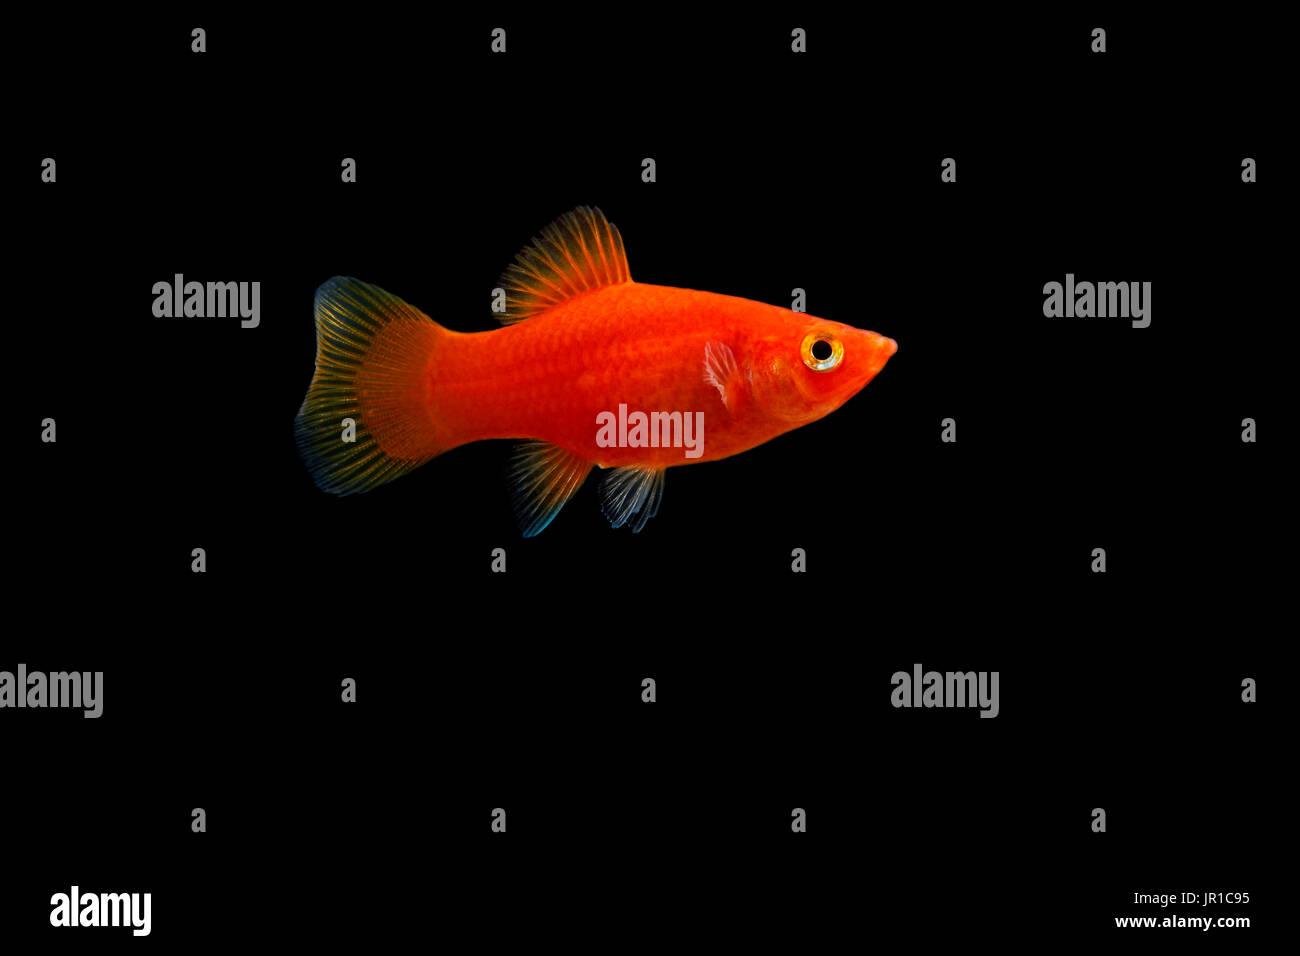 Platy Fish Stock Photos & Platy Fish Stock Images - Alamy